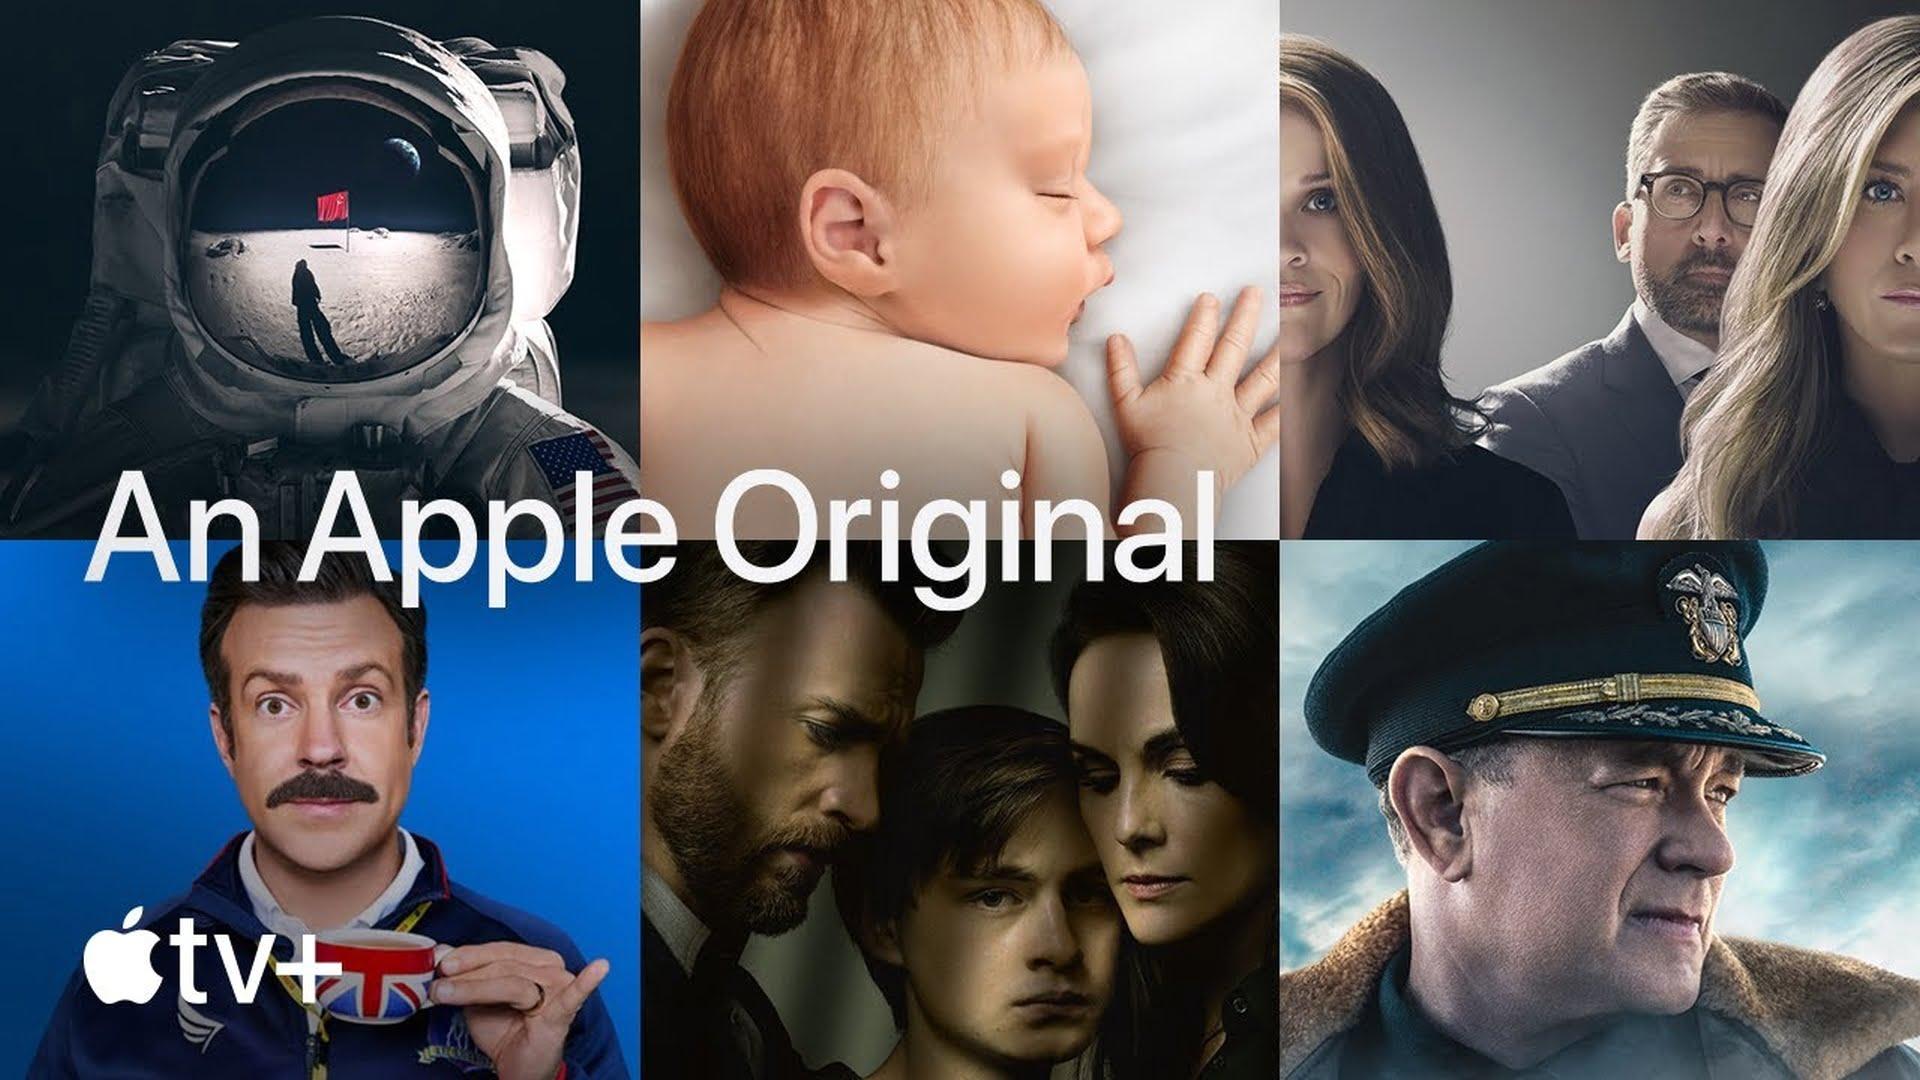 Nowa reklama Apple TV+ promująca autorskie seriale Apple